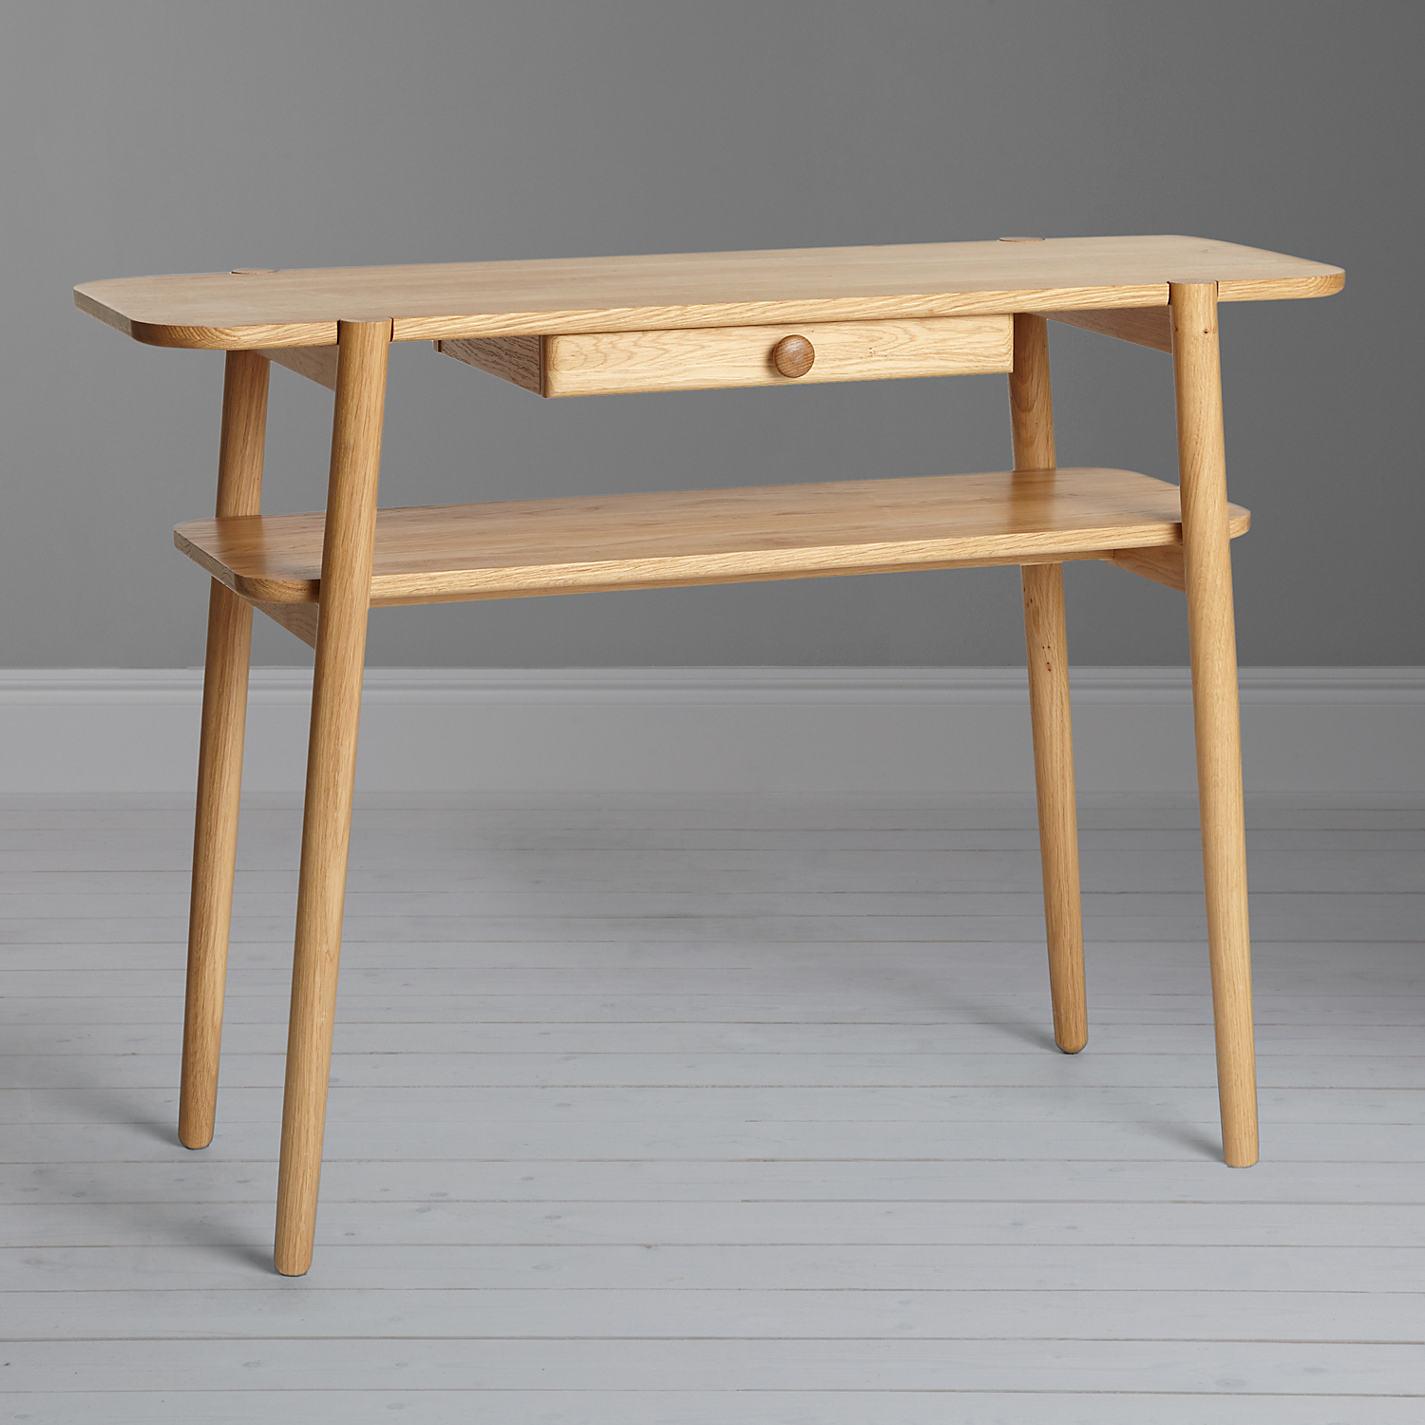 Buy Design Project by John Lewis No.022 Console Table, Oak | John ...